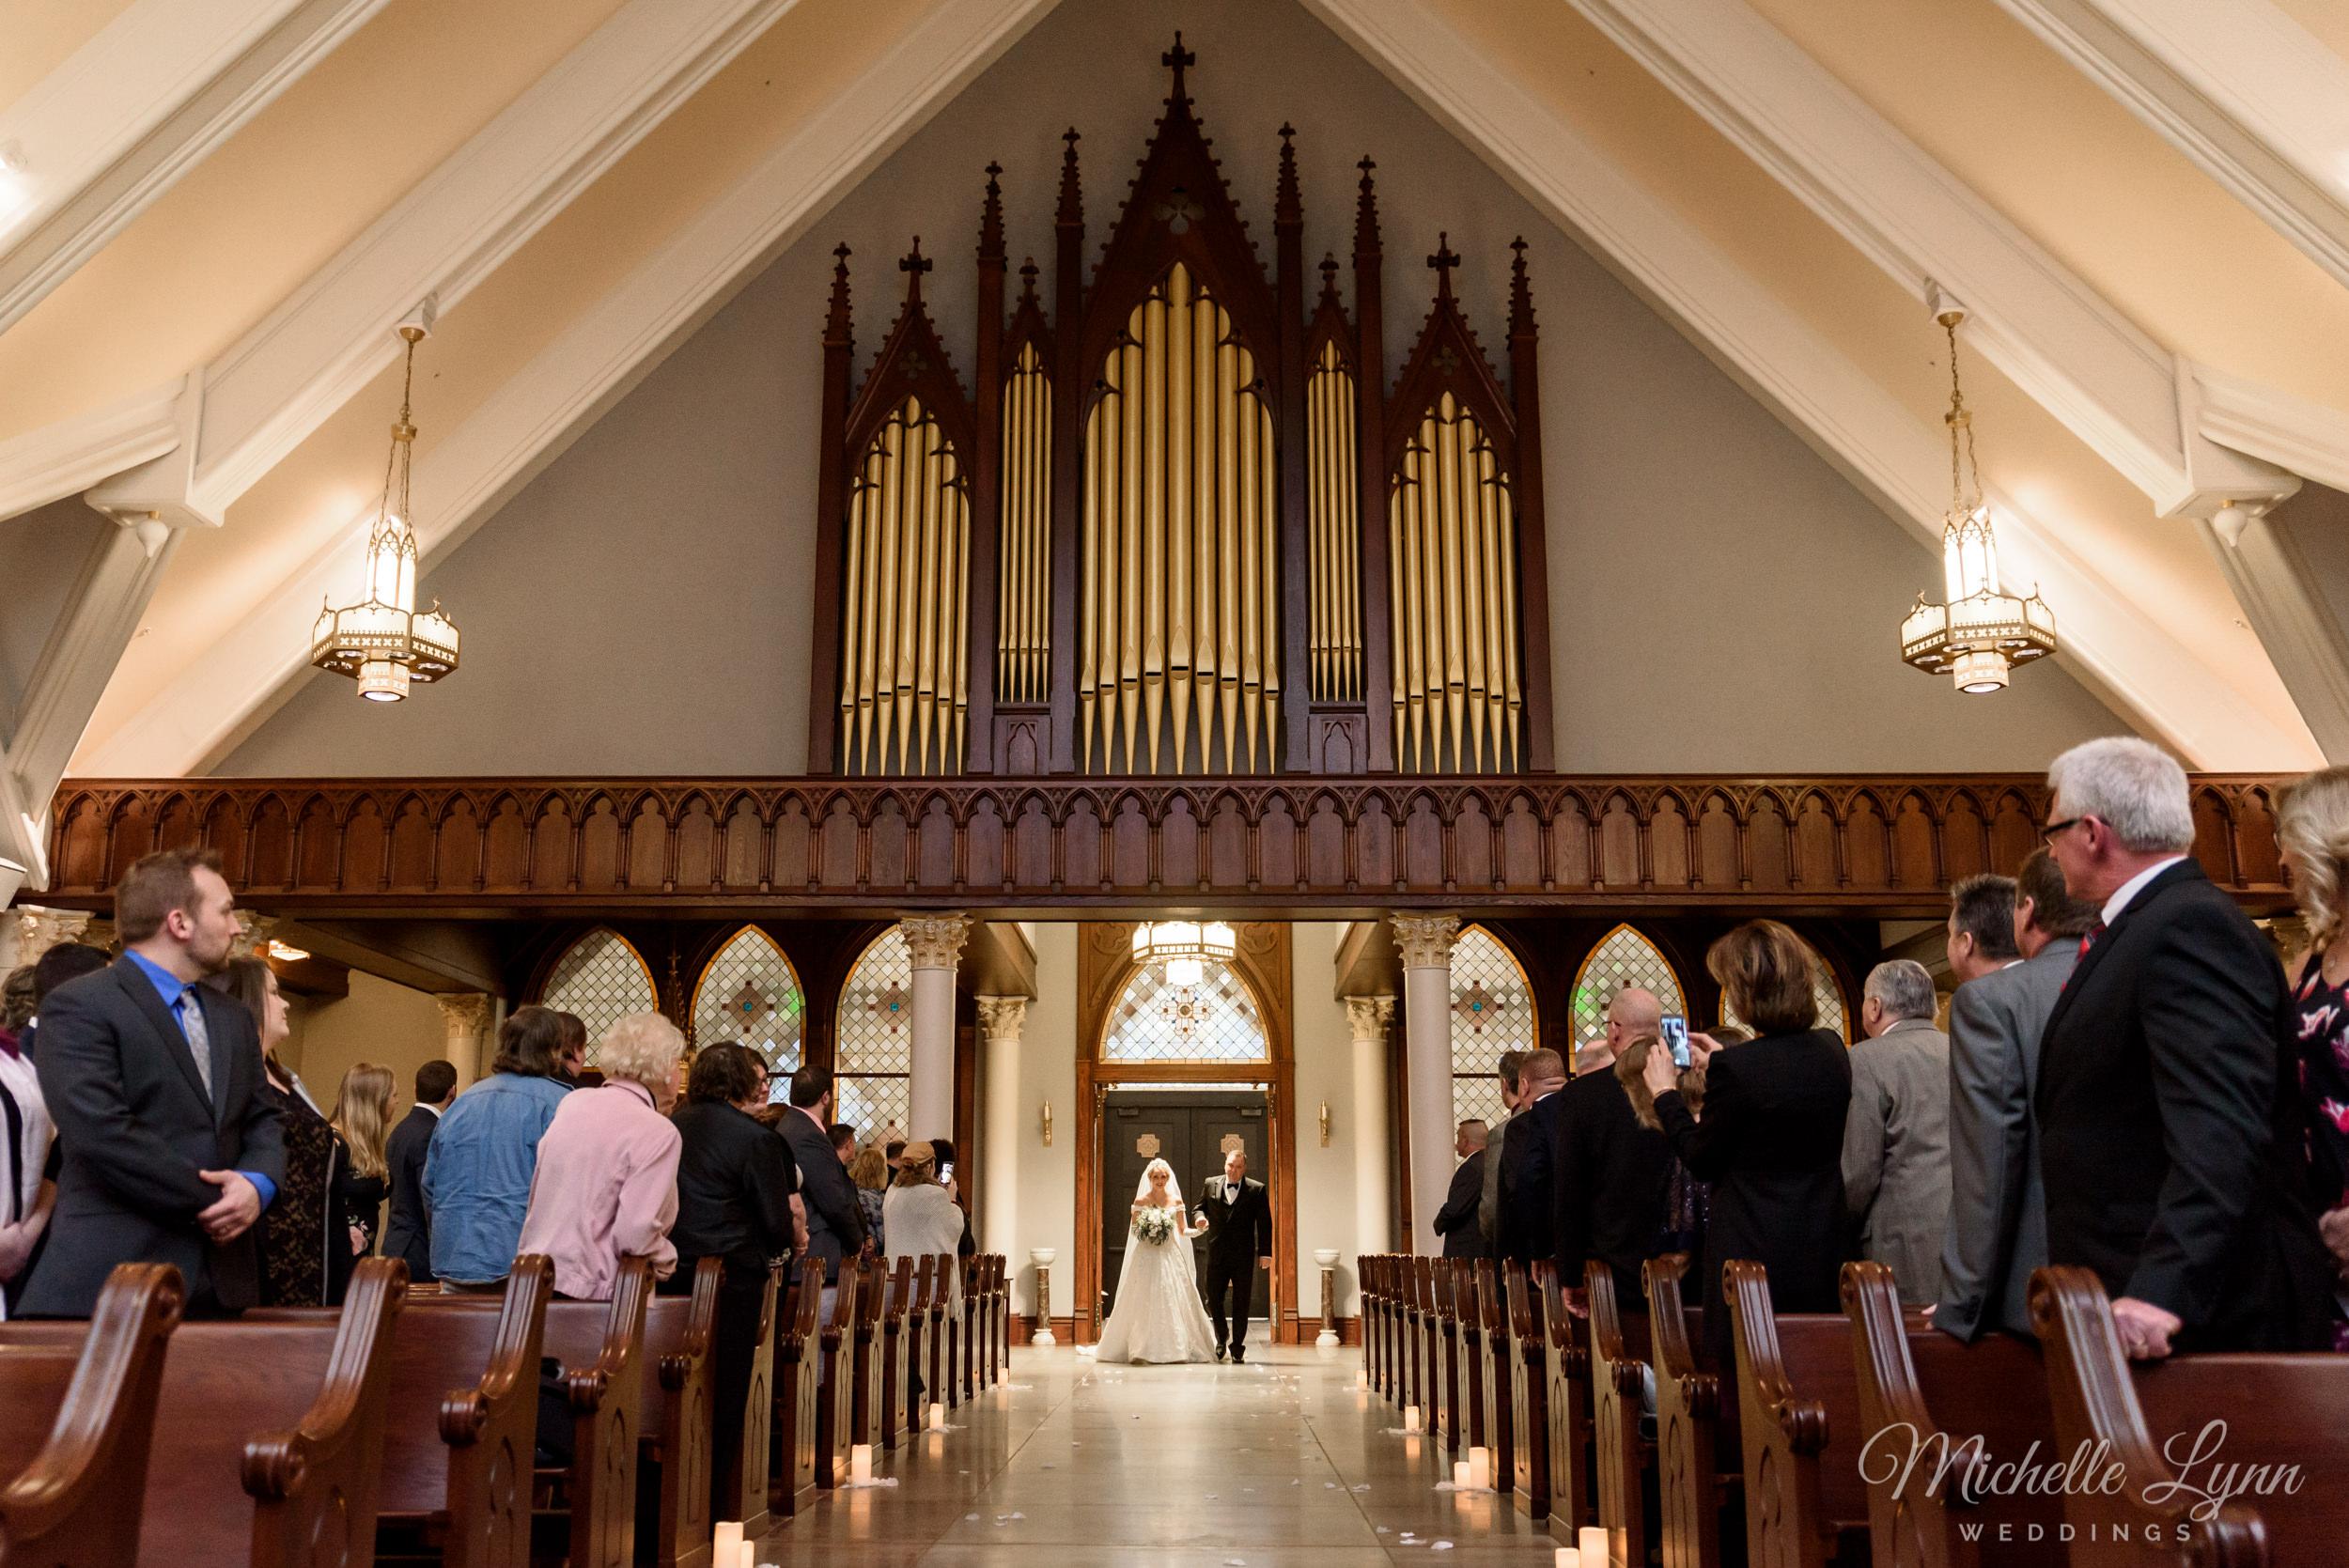 william-penn-inn-wedding-photography-mlw-47.jpg